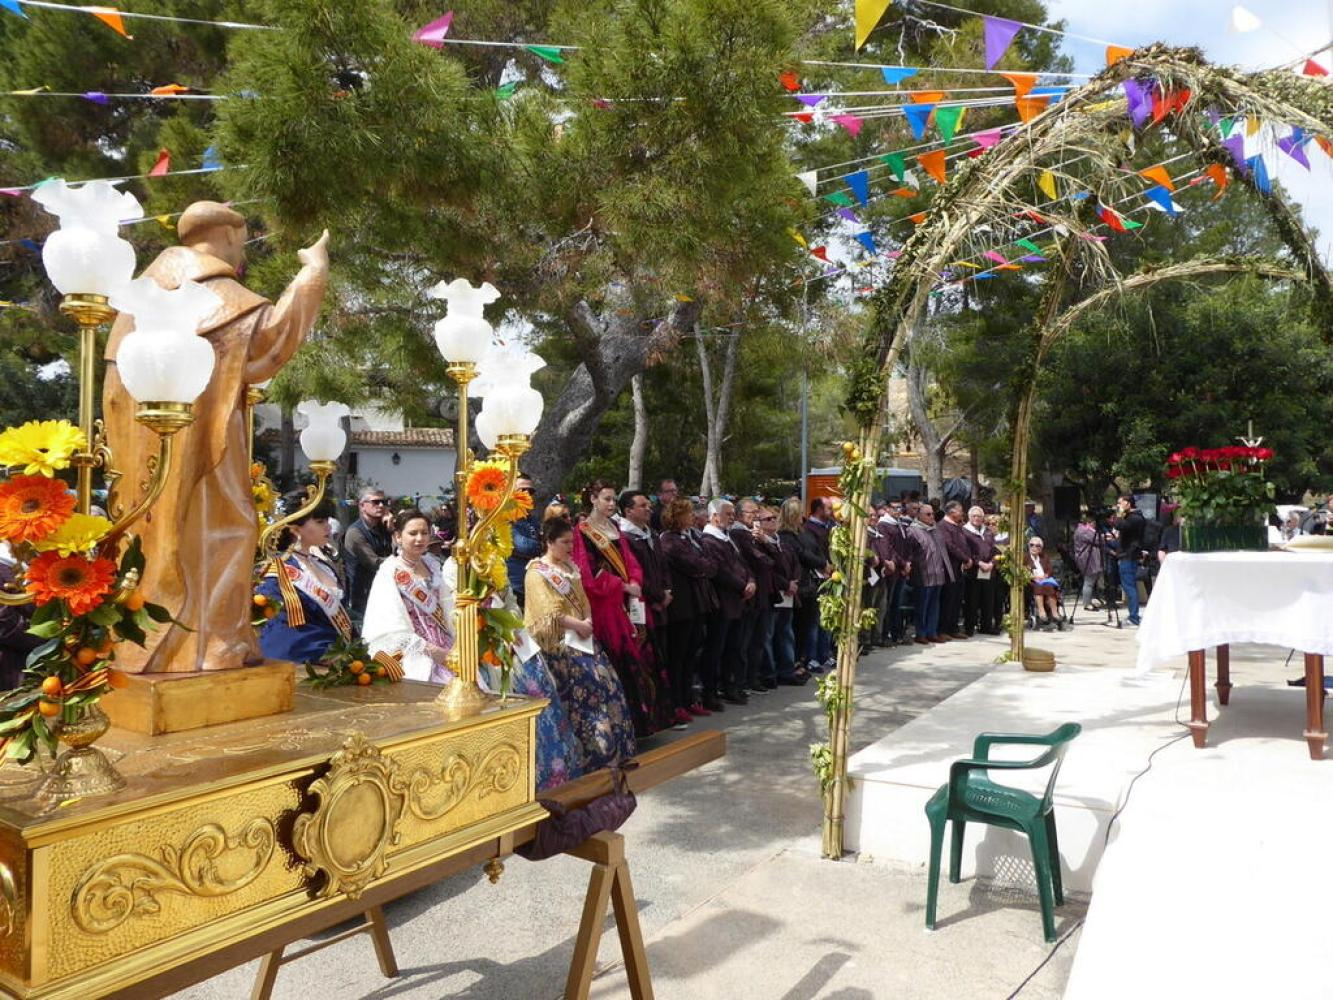 La Nucia sant vicent festes 5 2019